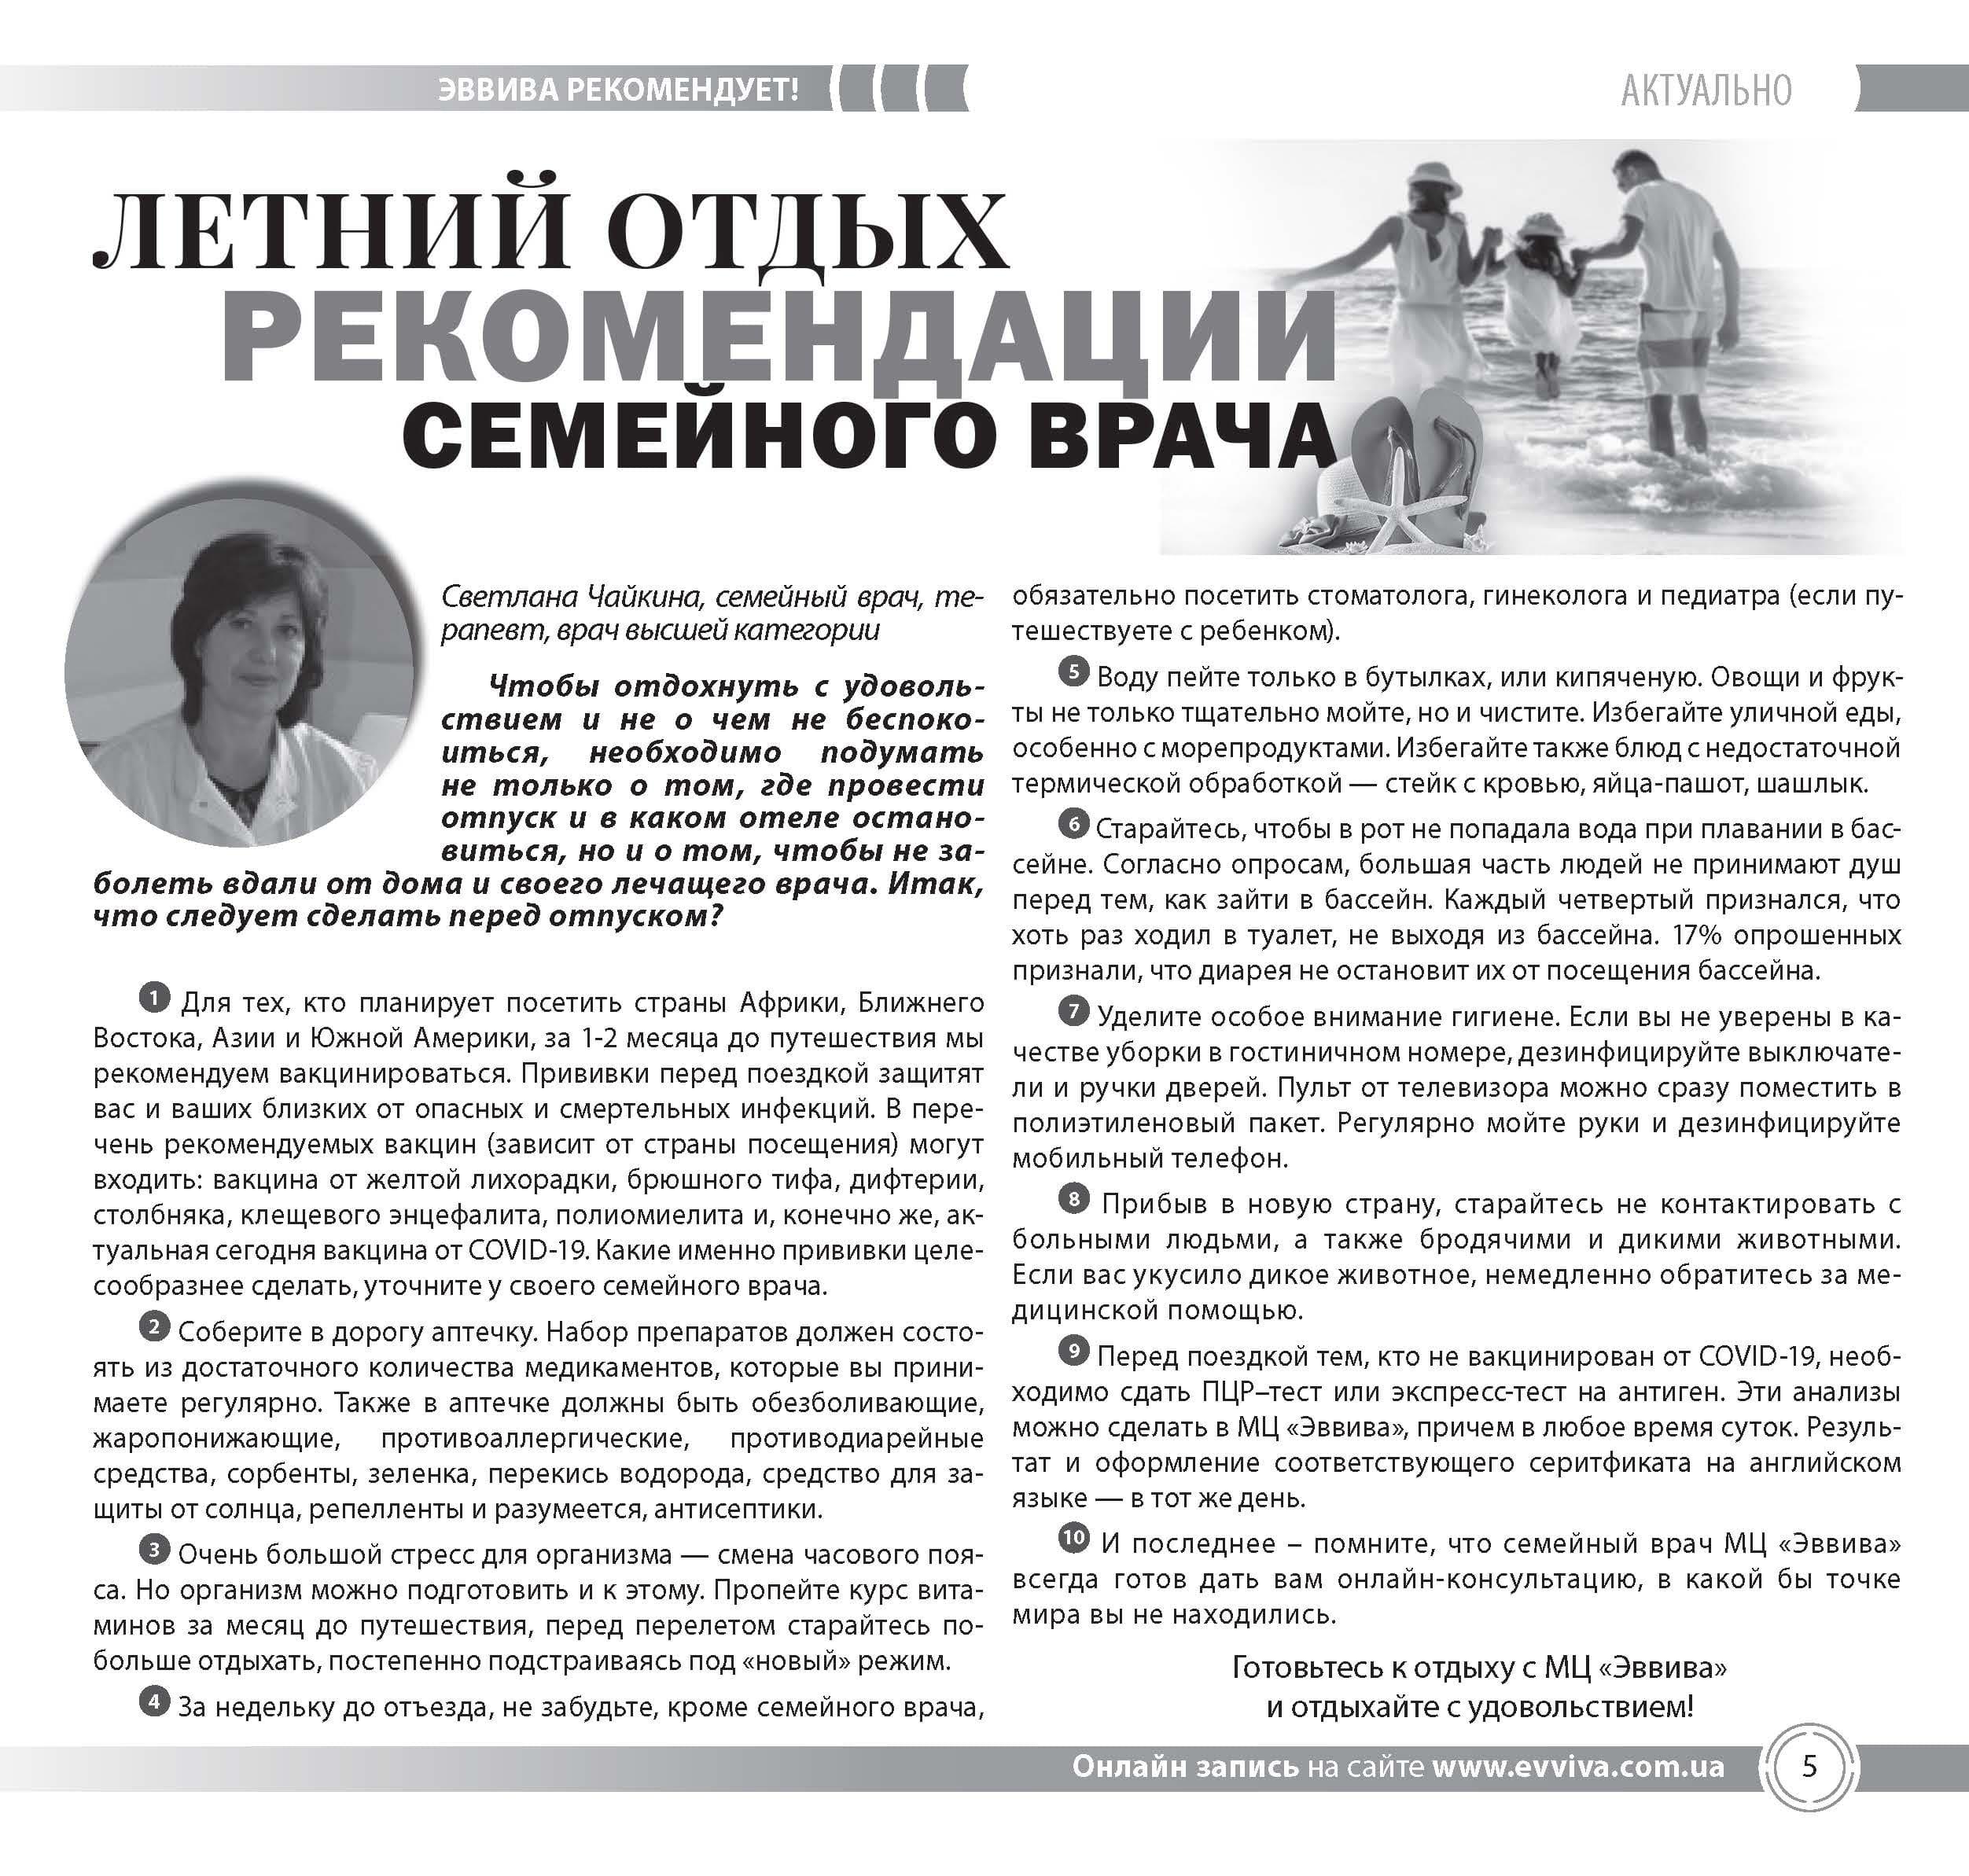 evviva-zhurnal-119-page5